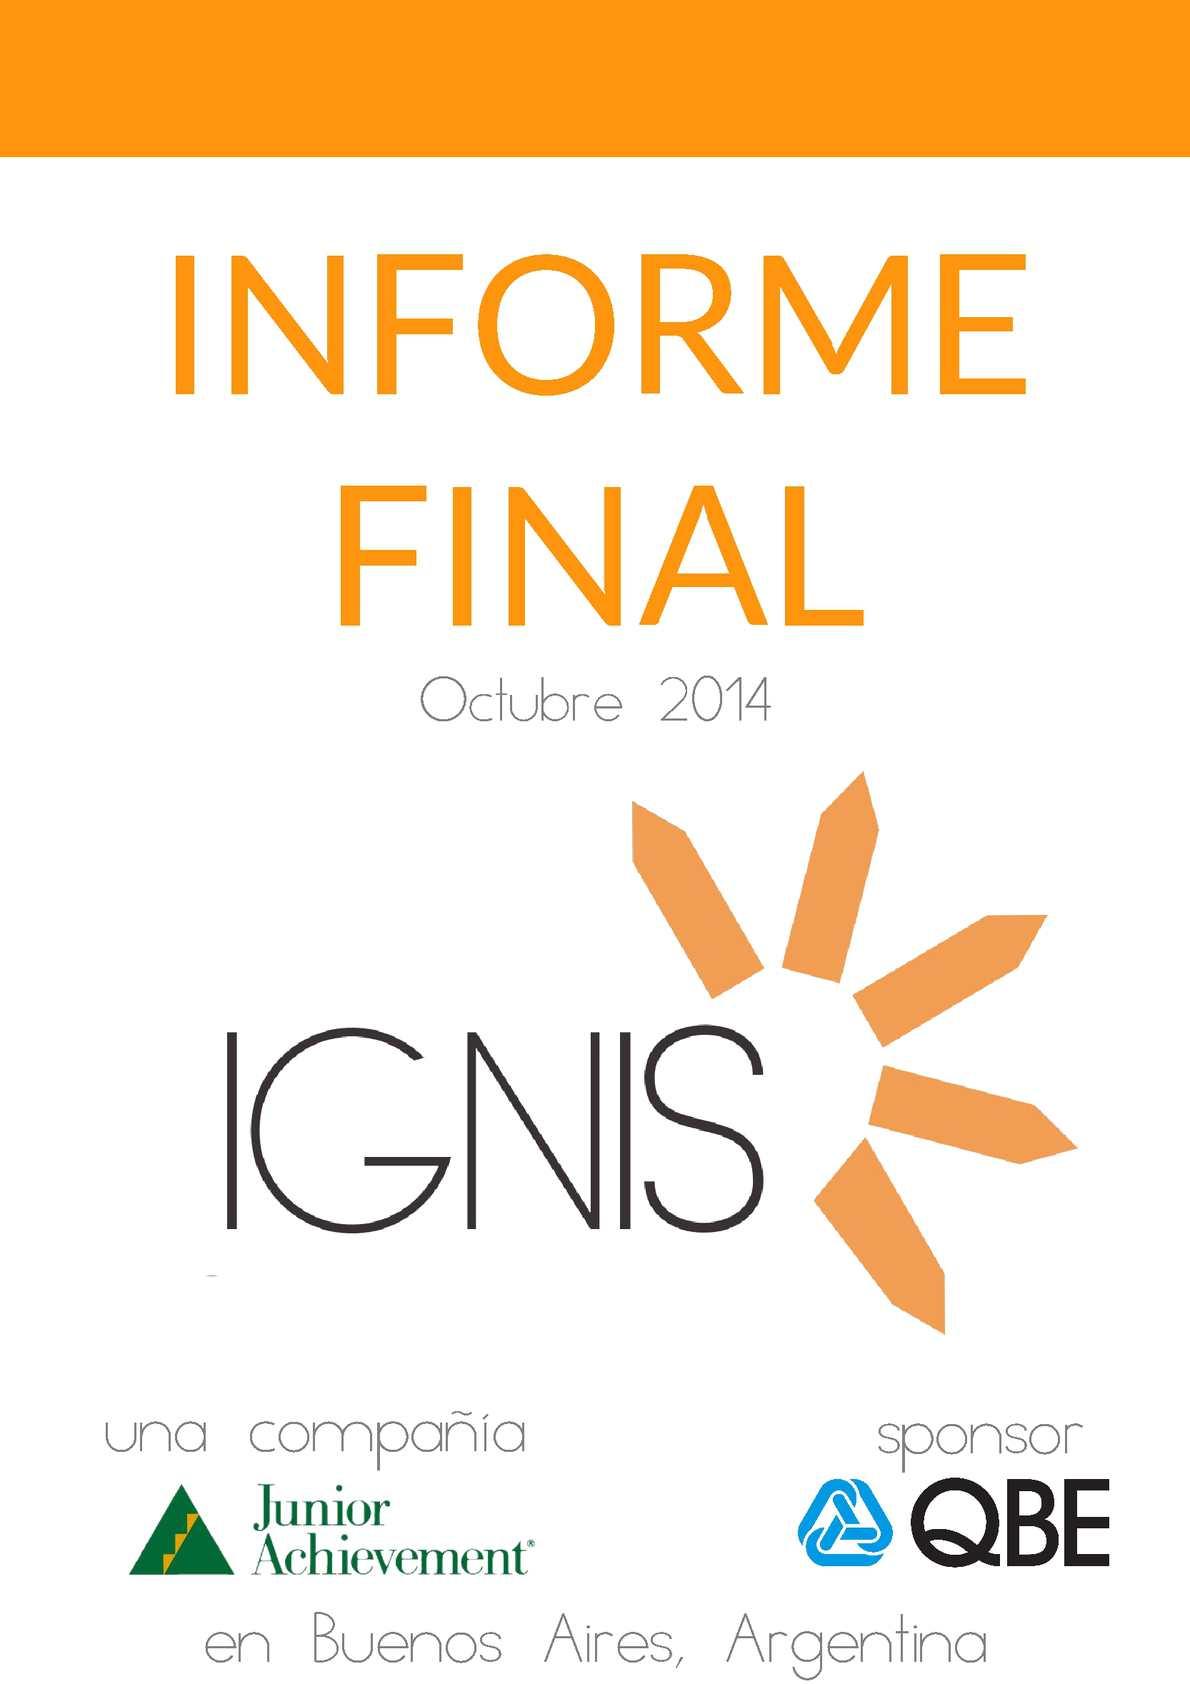 Ejemplo Informe Final